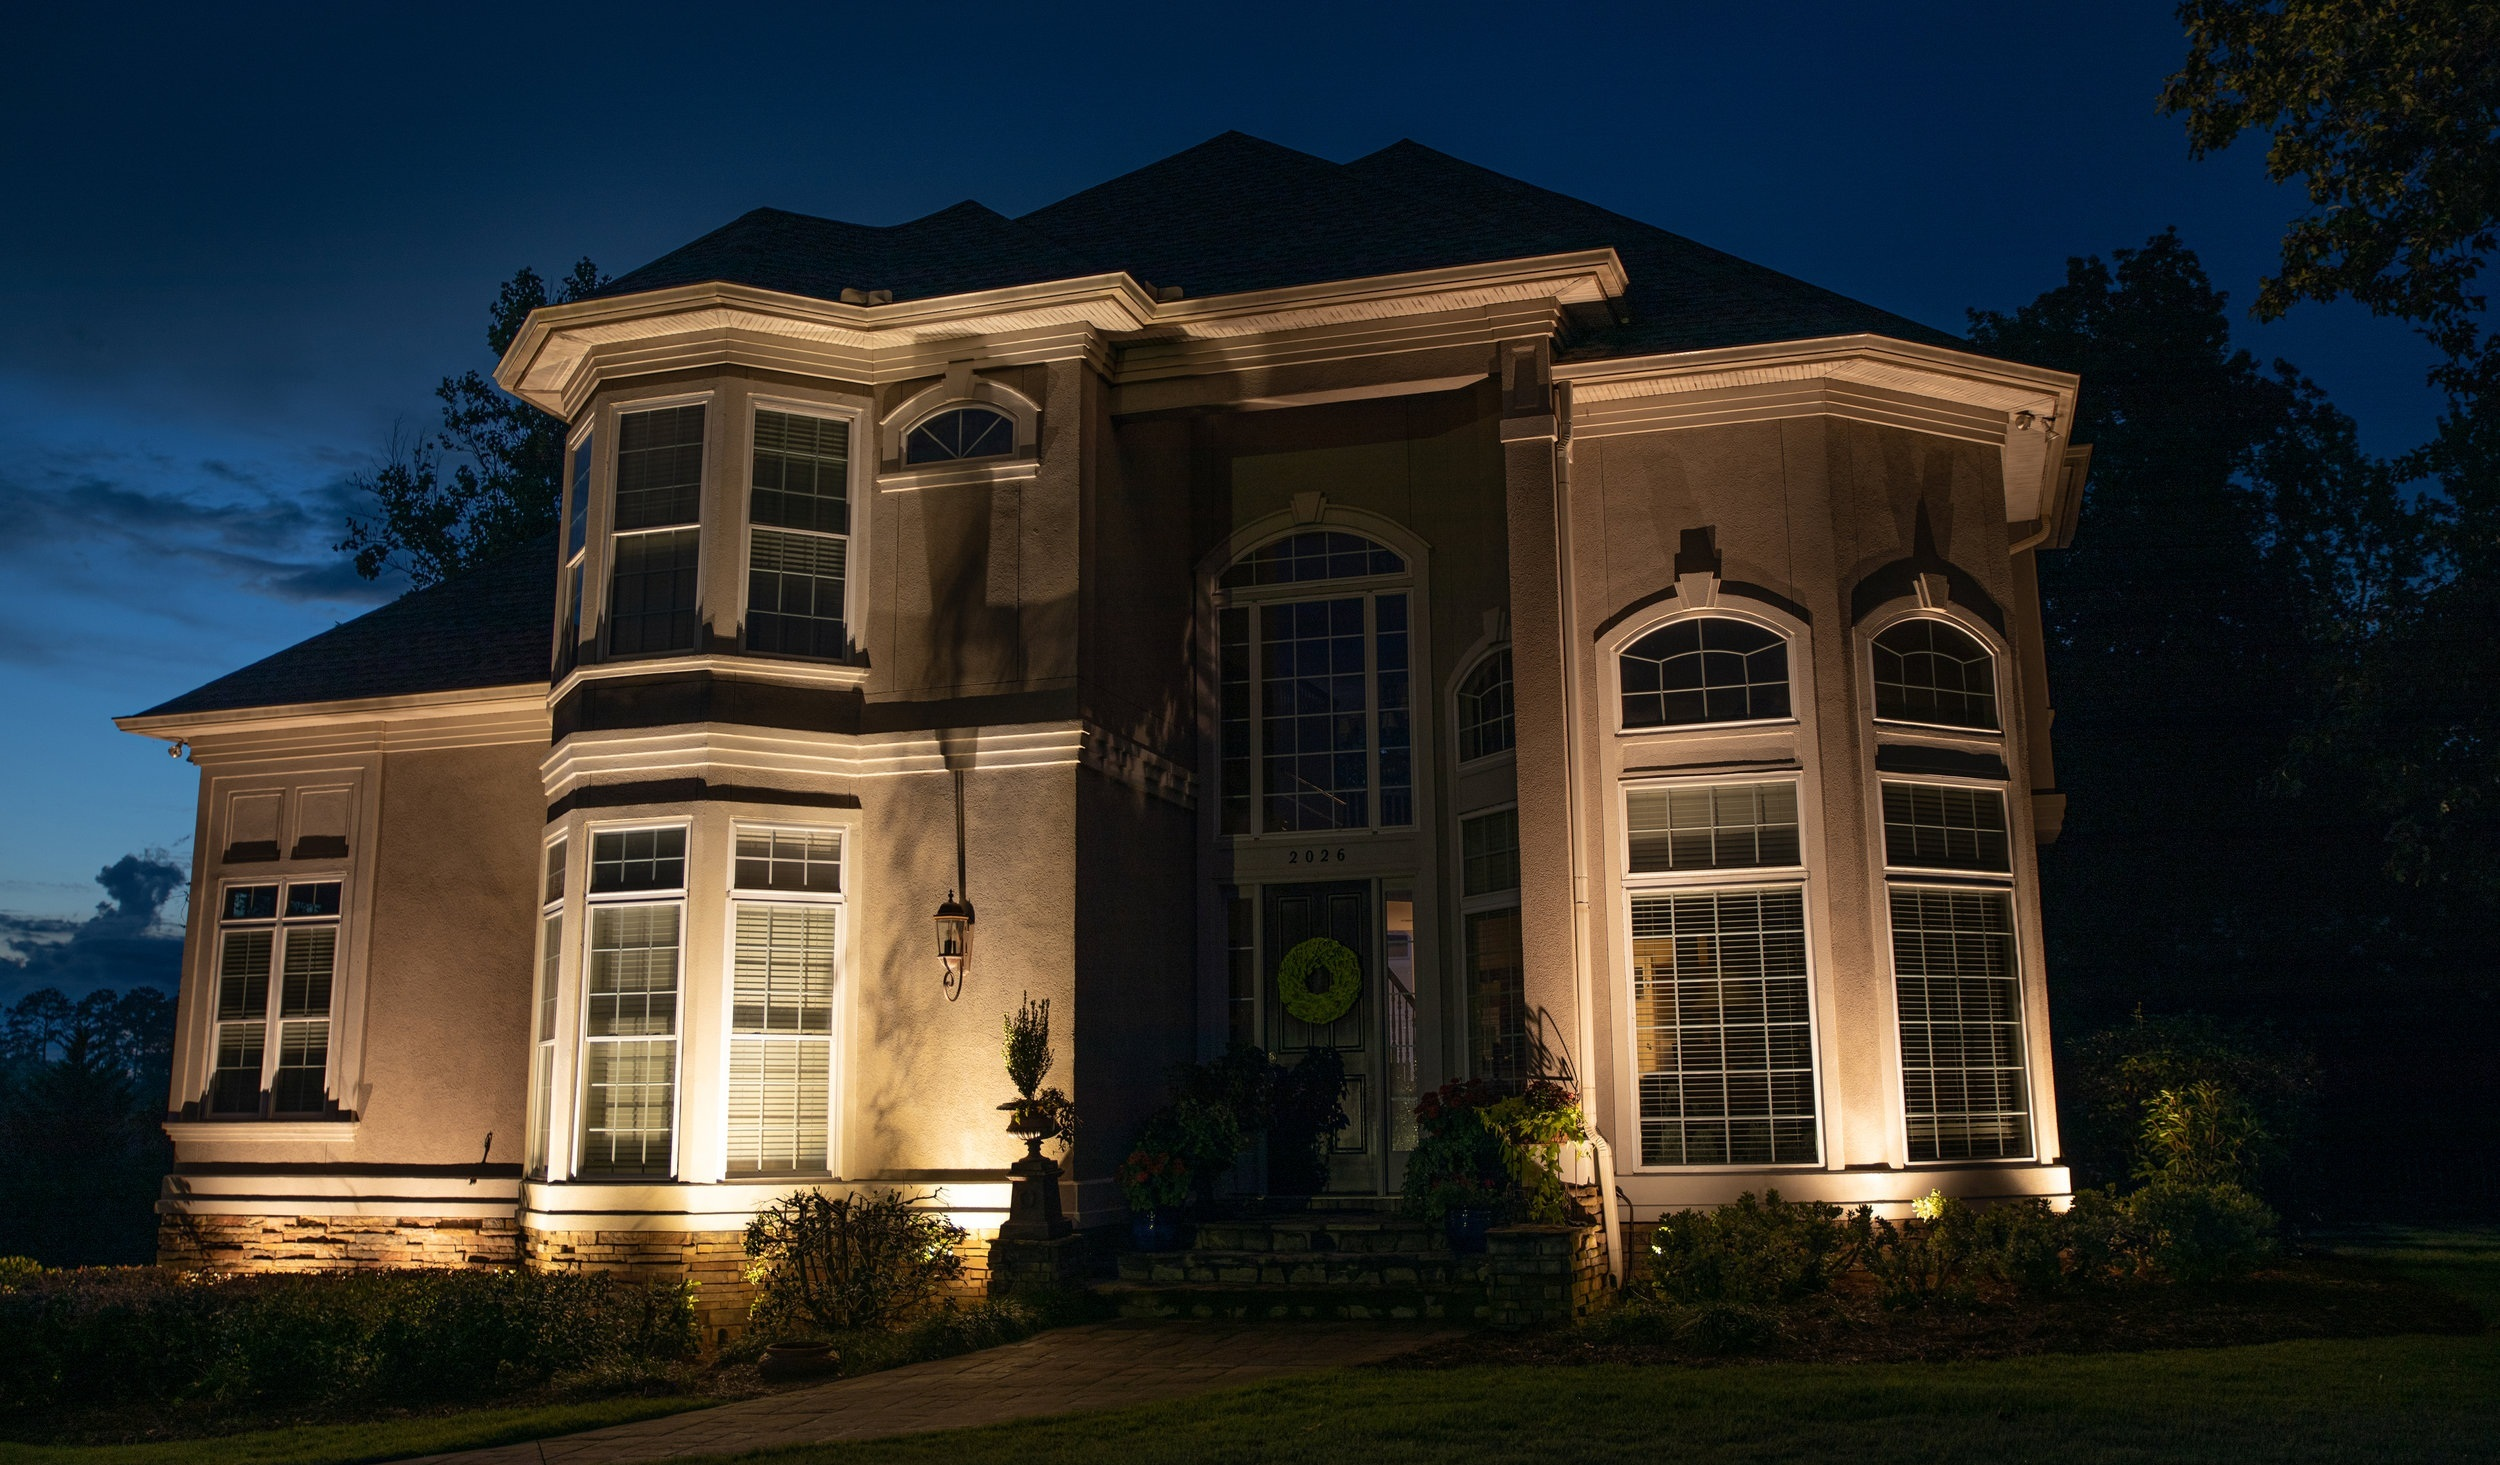 Holley Landscape Lighting - Outdoor Lighting